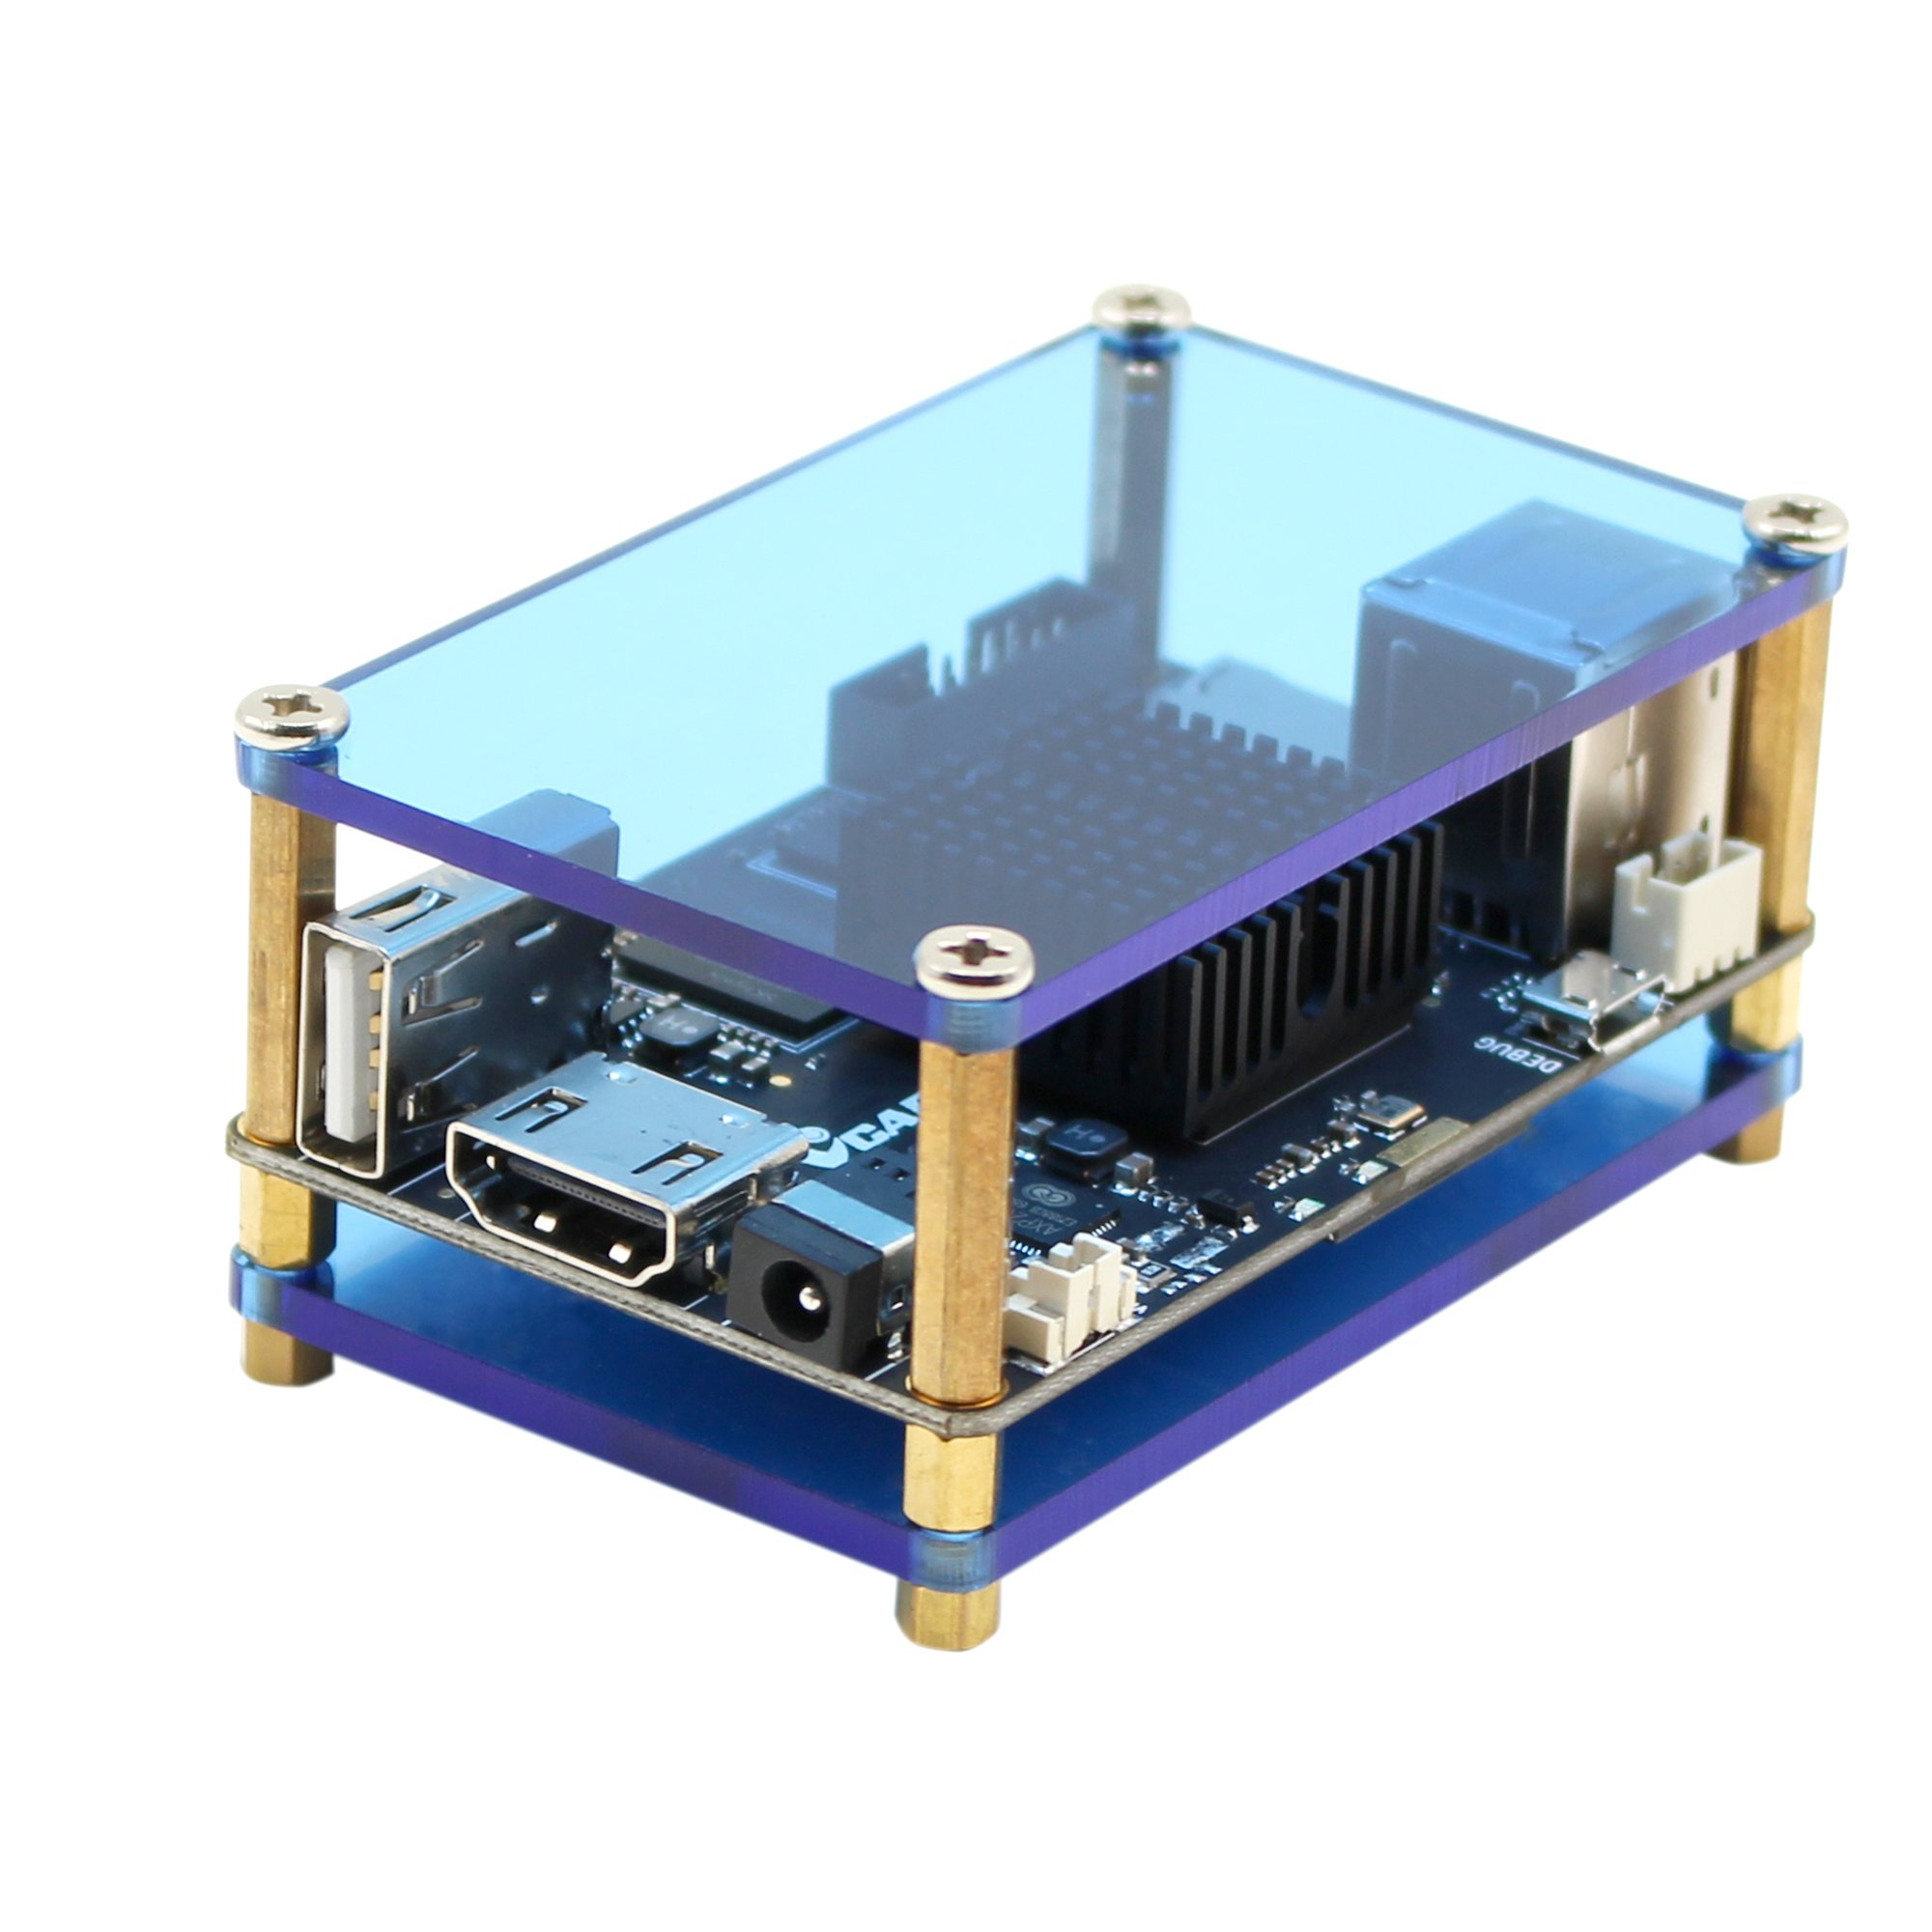 ELP Allwinner A20 ARM Cortex-A7 Dual-Core @ 1GHz Linux WIFI Mini PC With USB And HDMI 1080P Recording